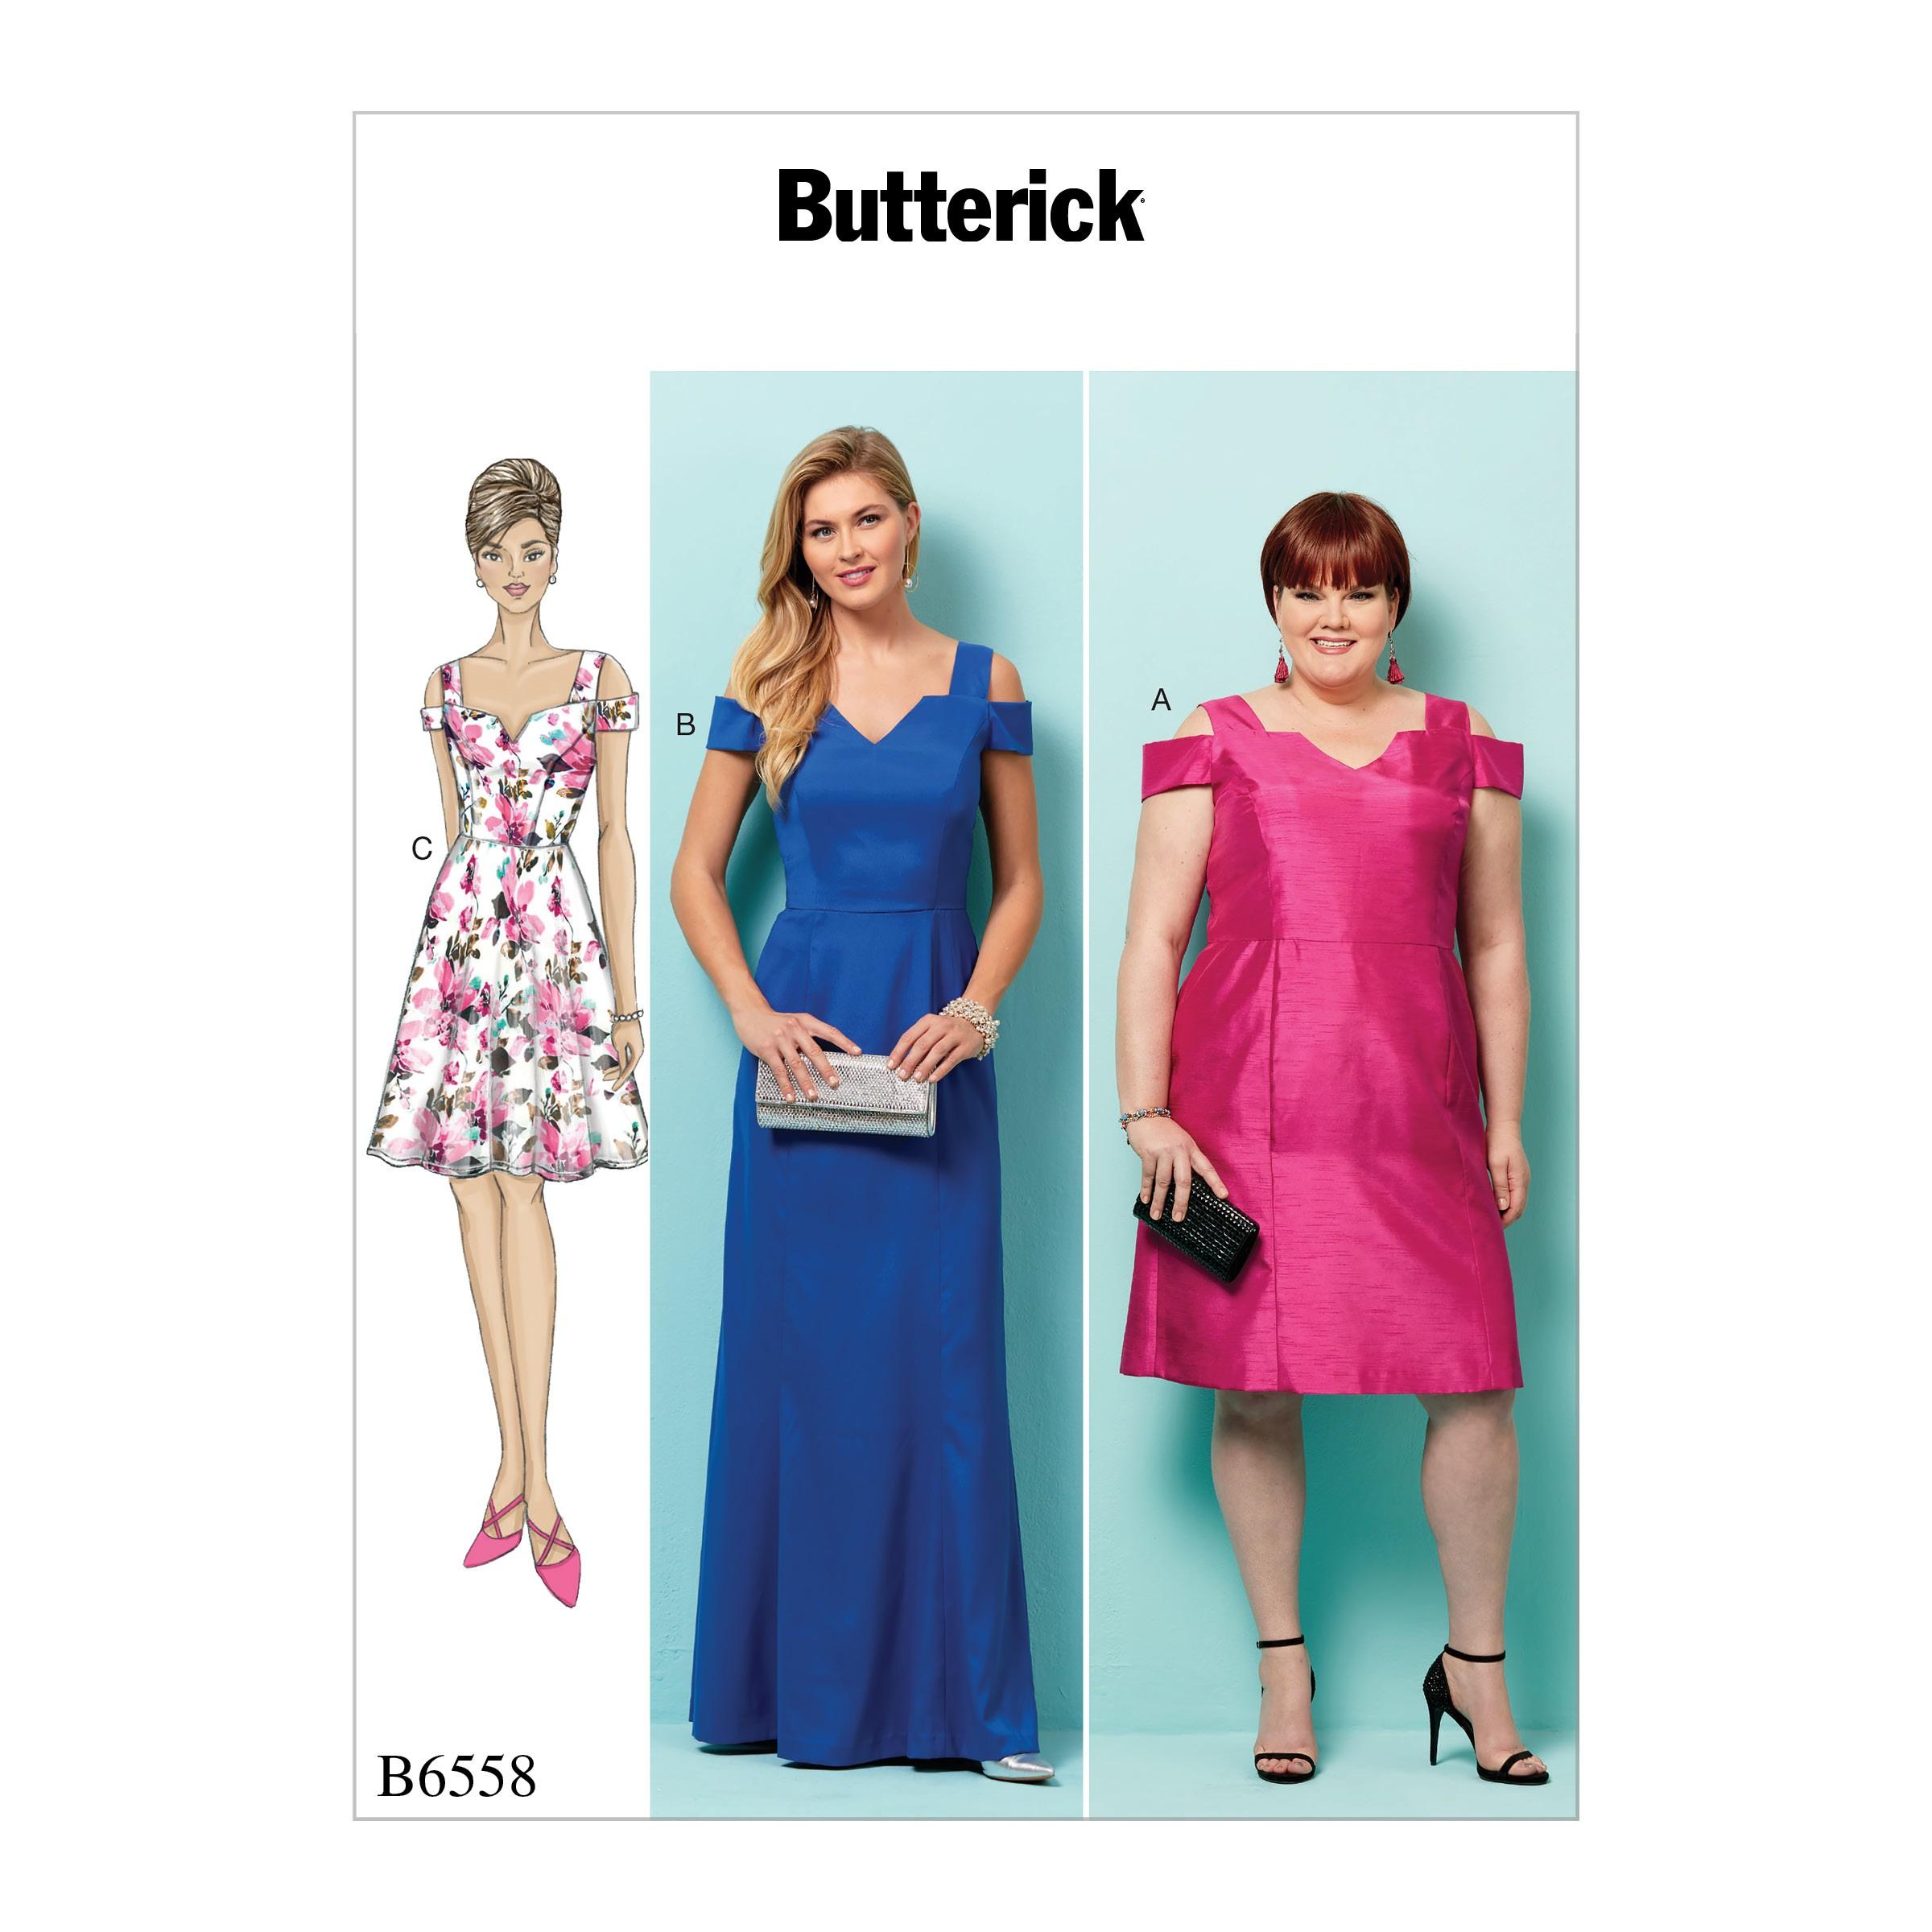 Butterick Sewing Pattern 6558 Misses' Women's Lined Bodice Dress